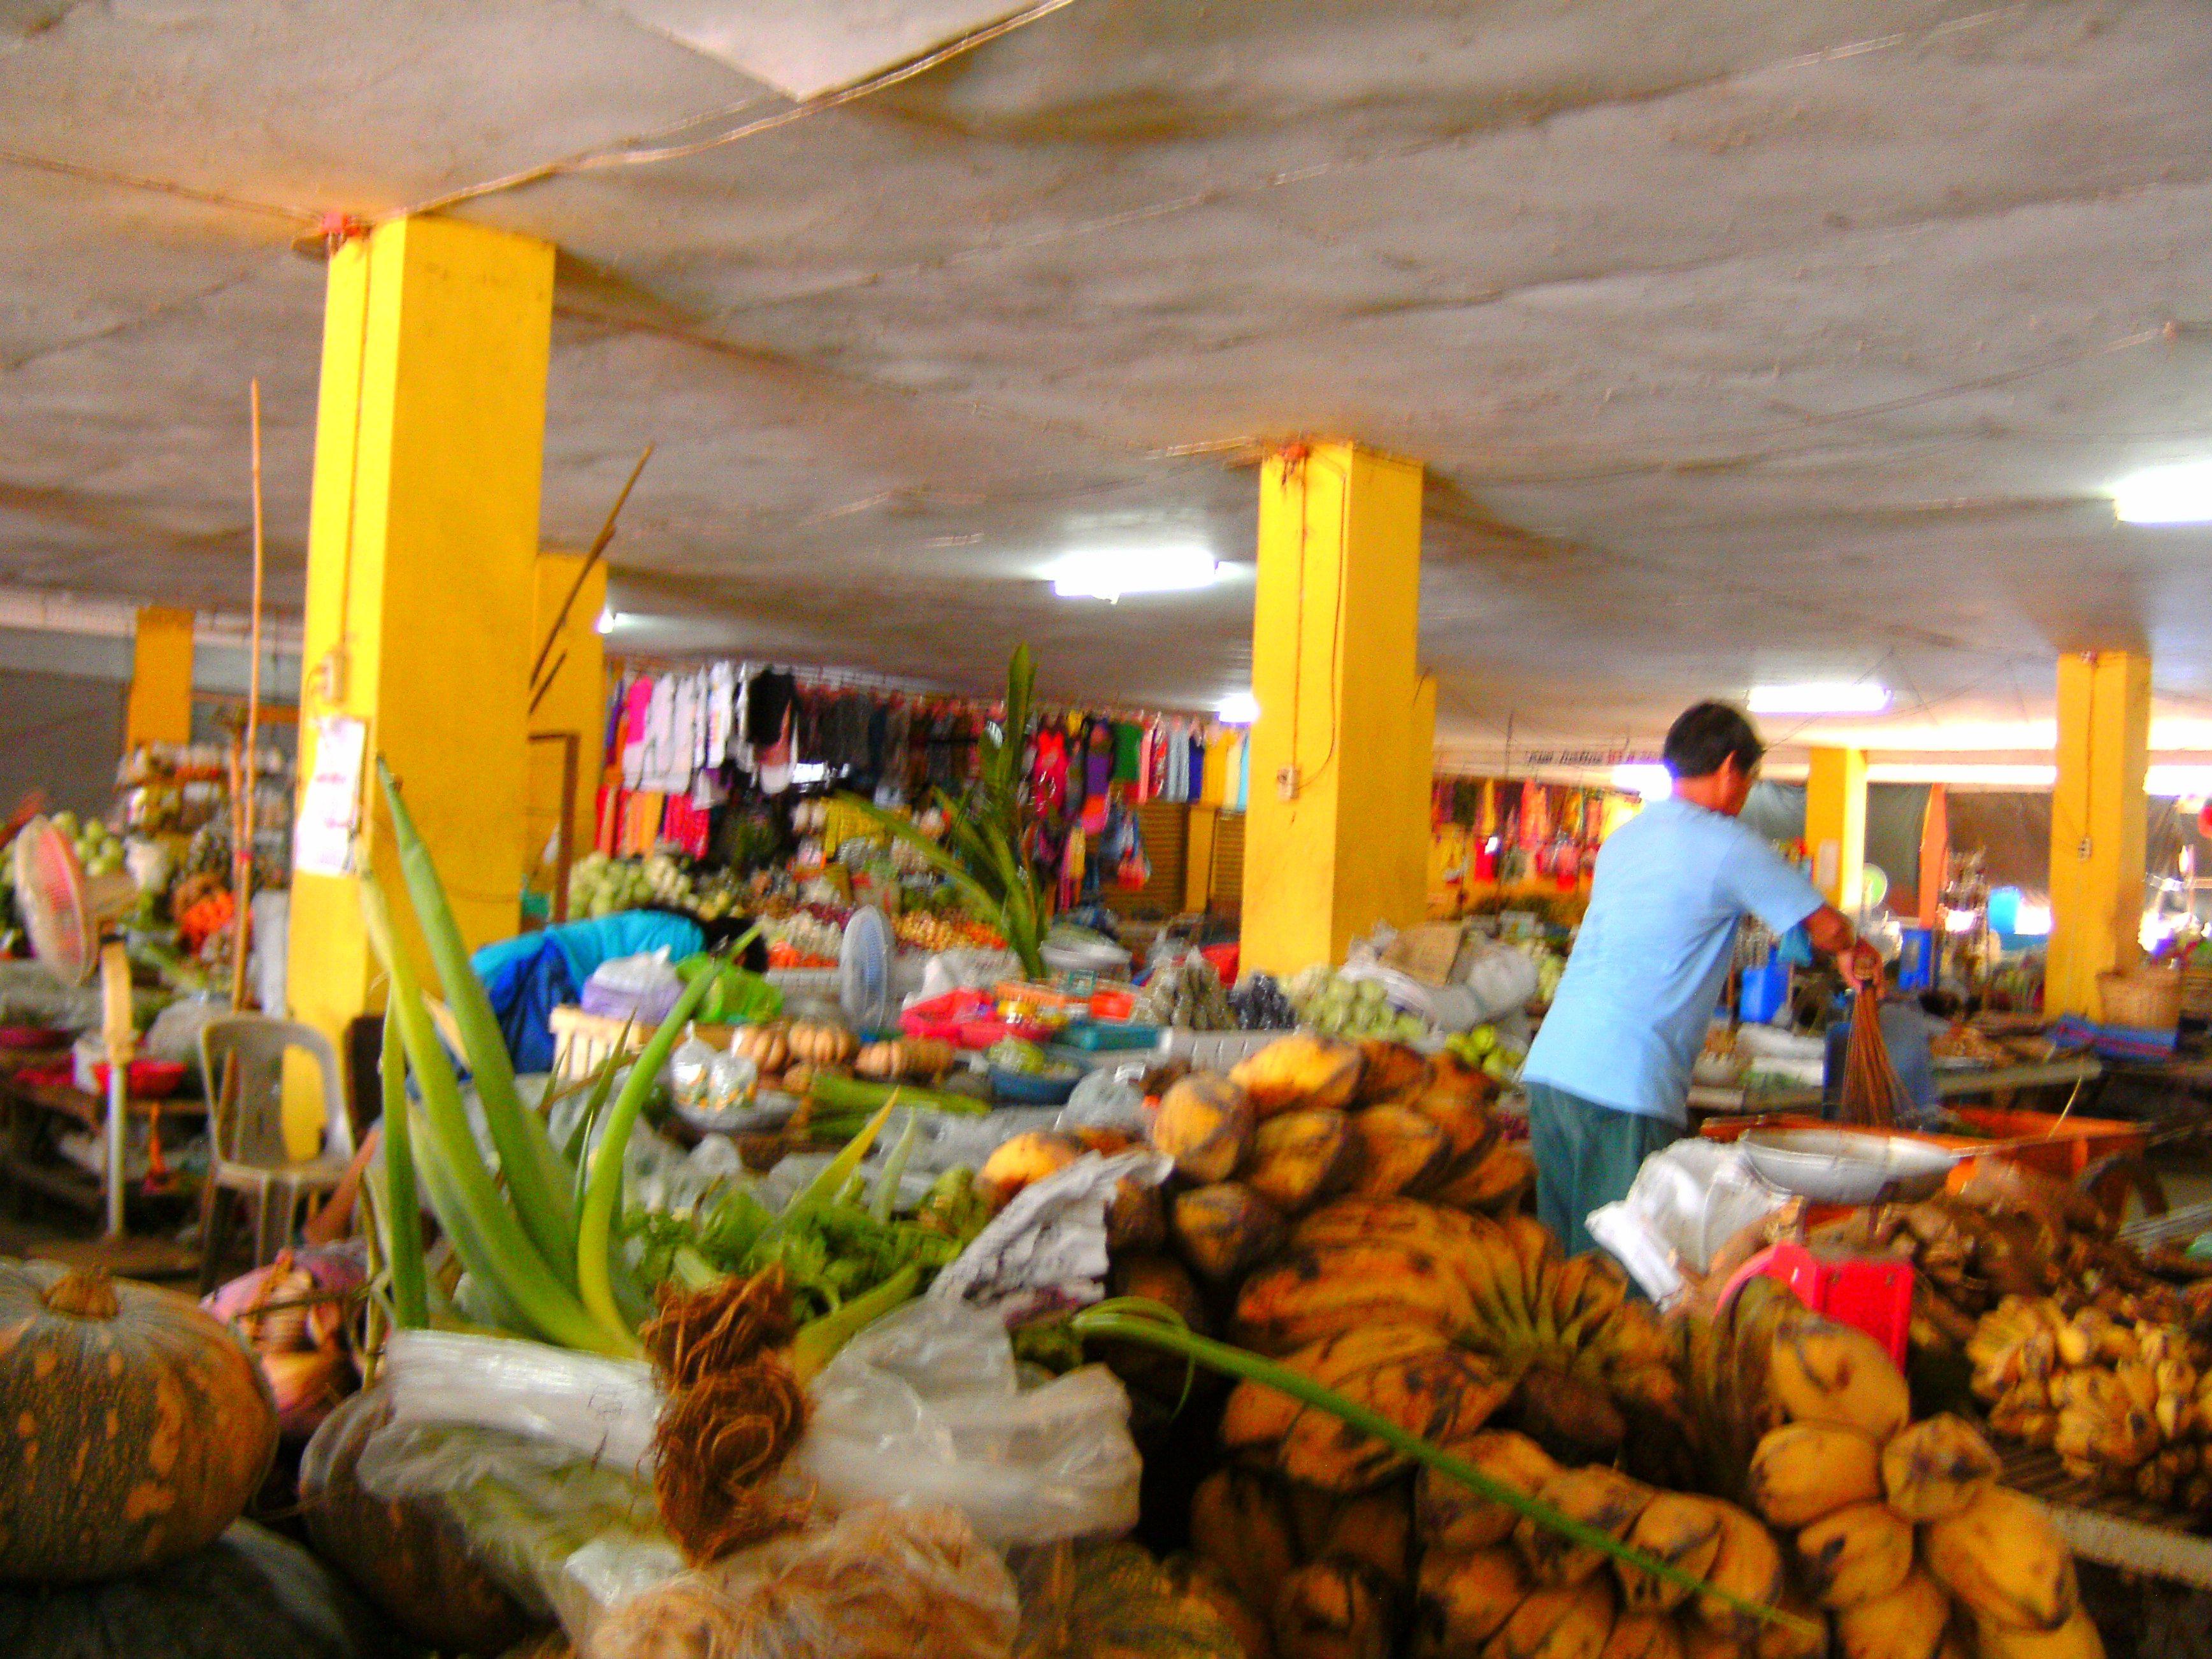 Small Market in Pangasinan